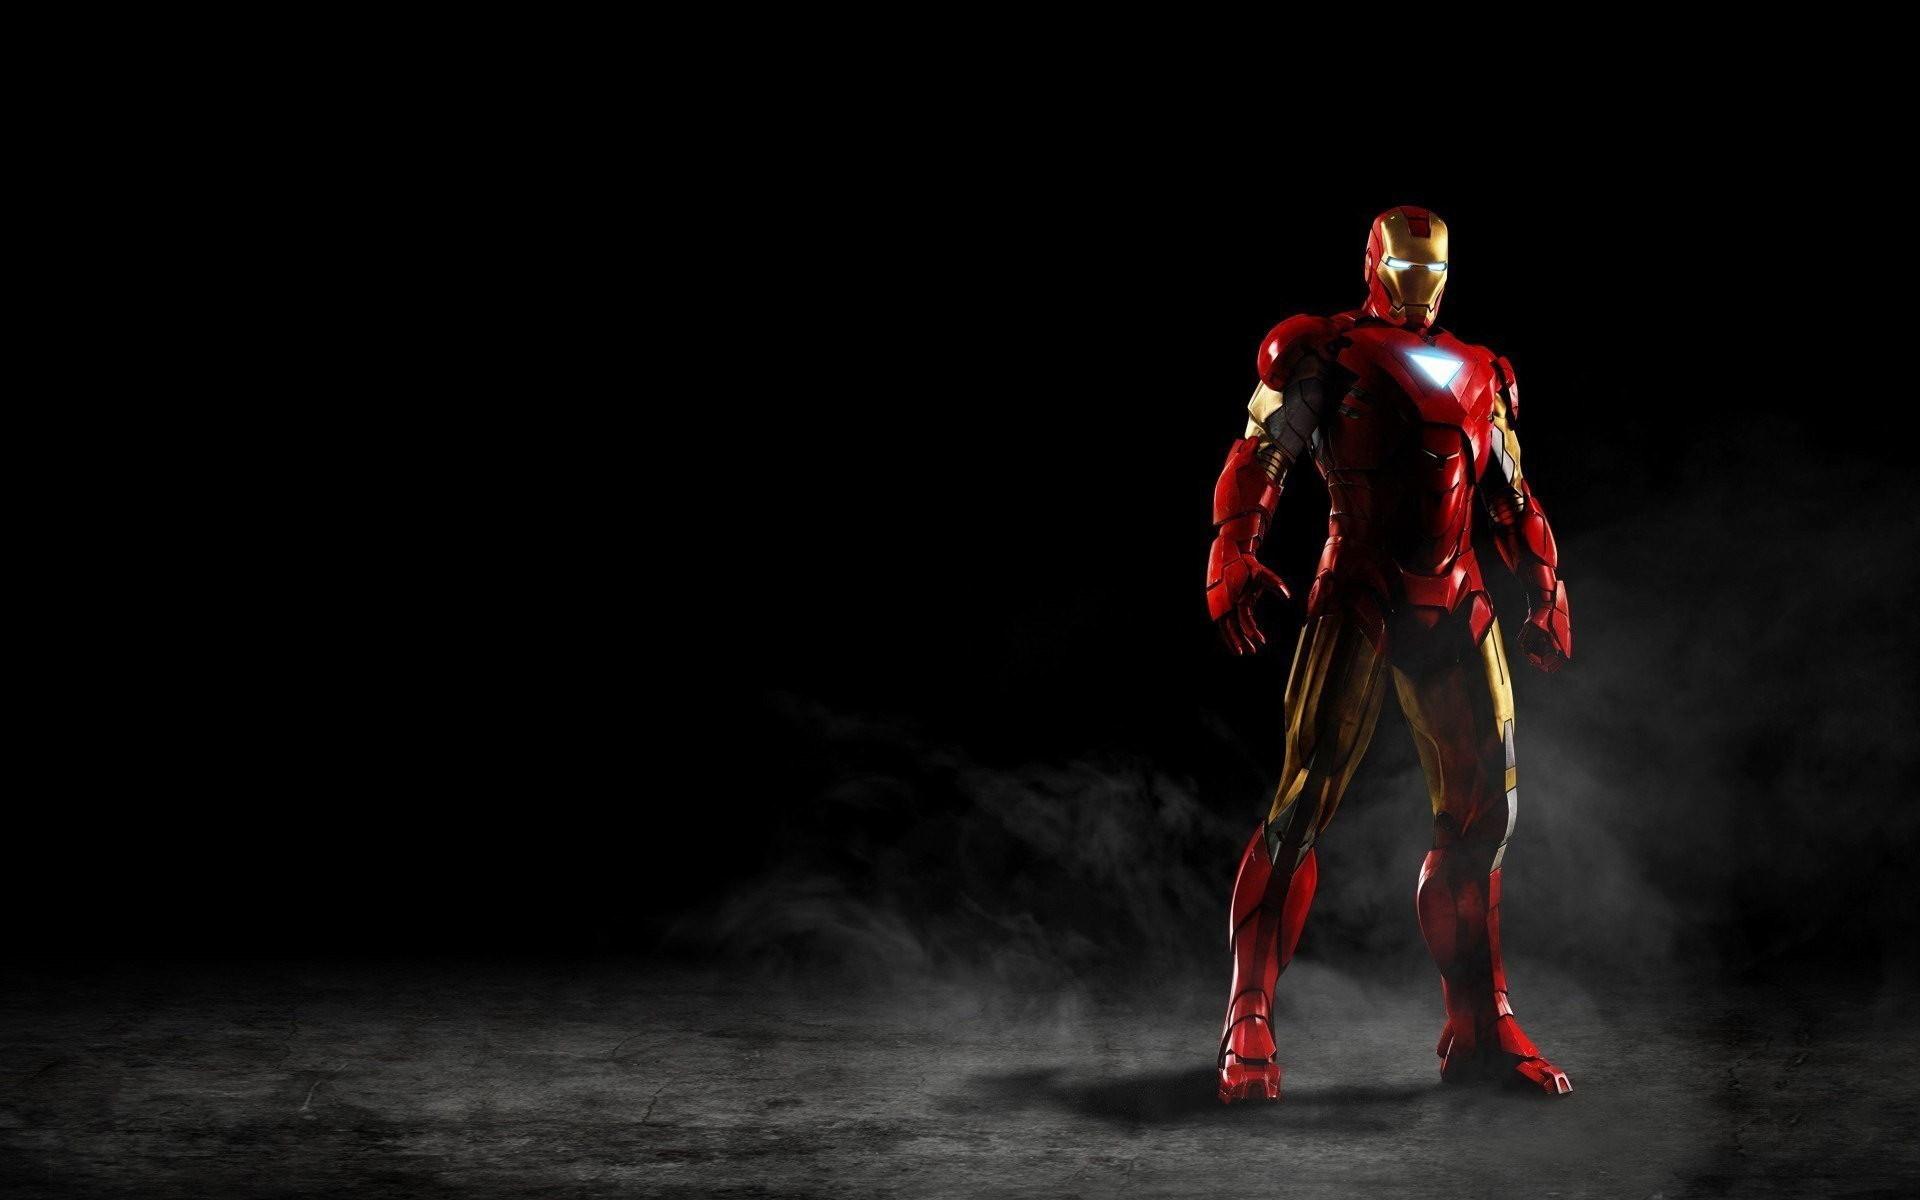 Super Hero HD Wallpaper